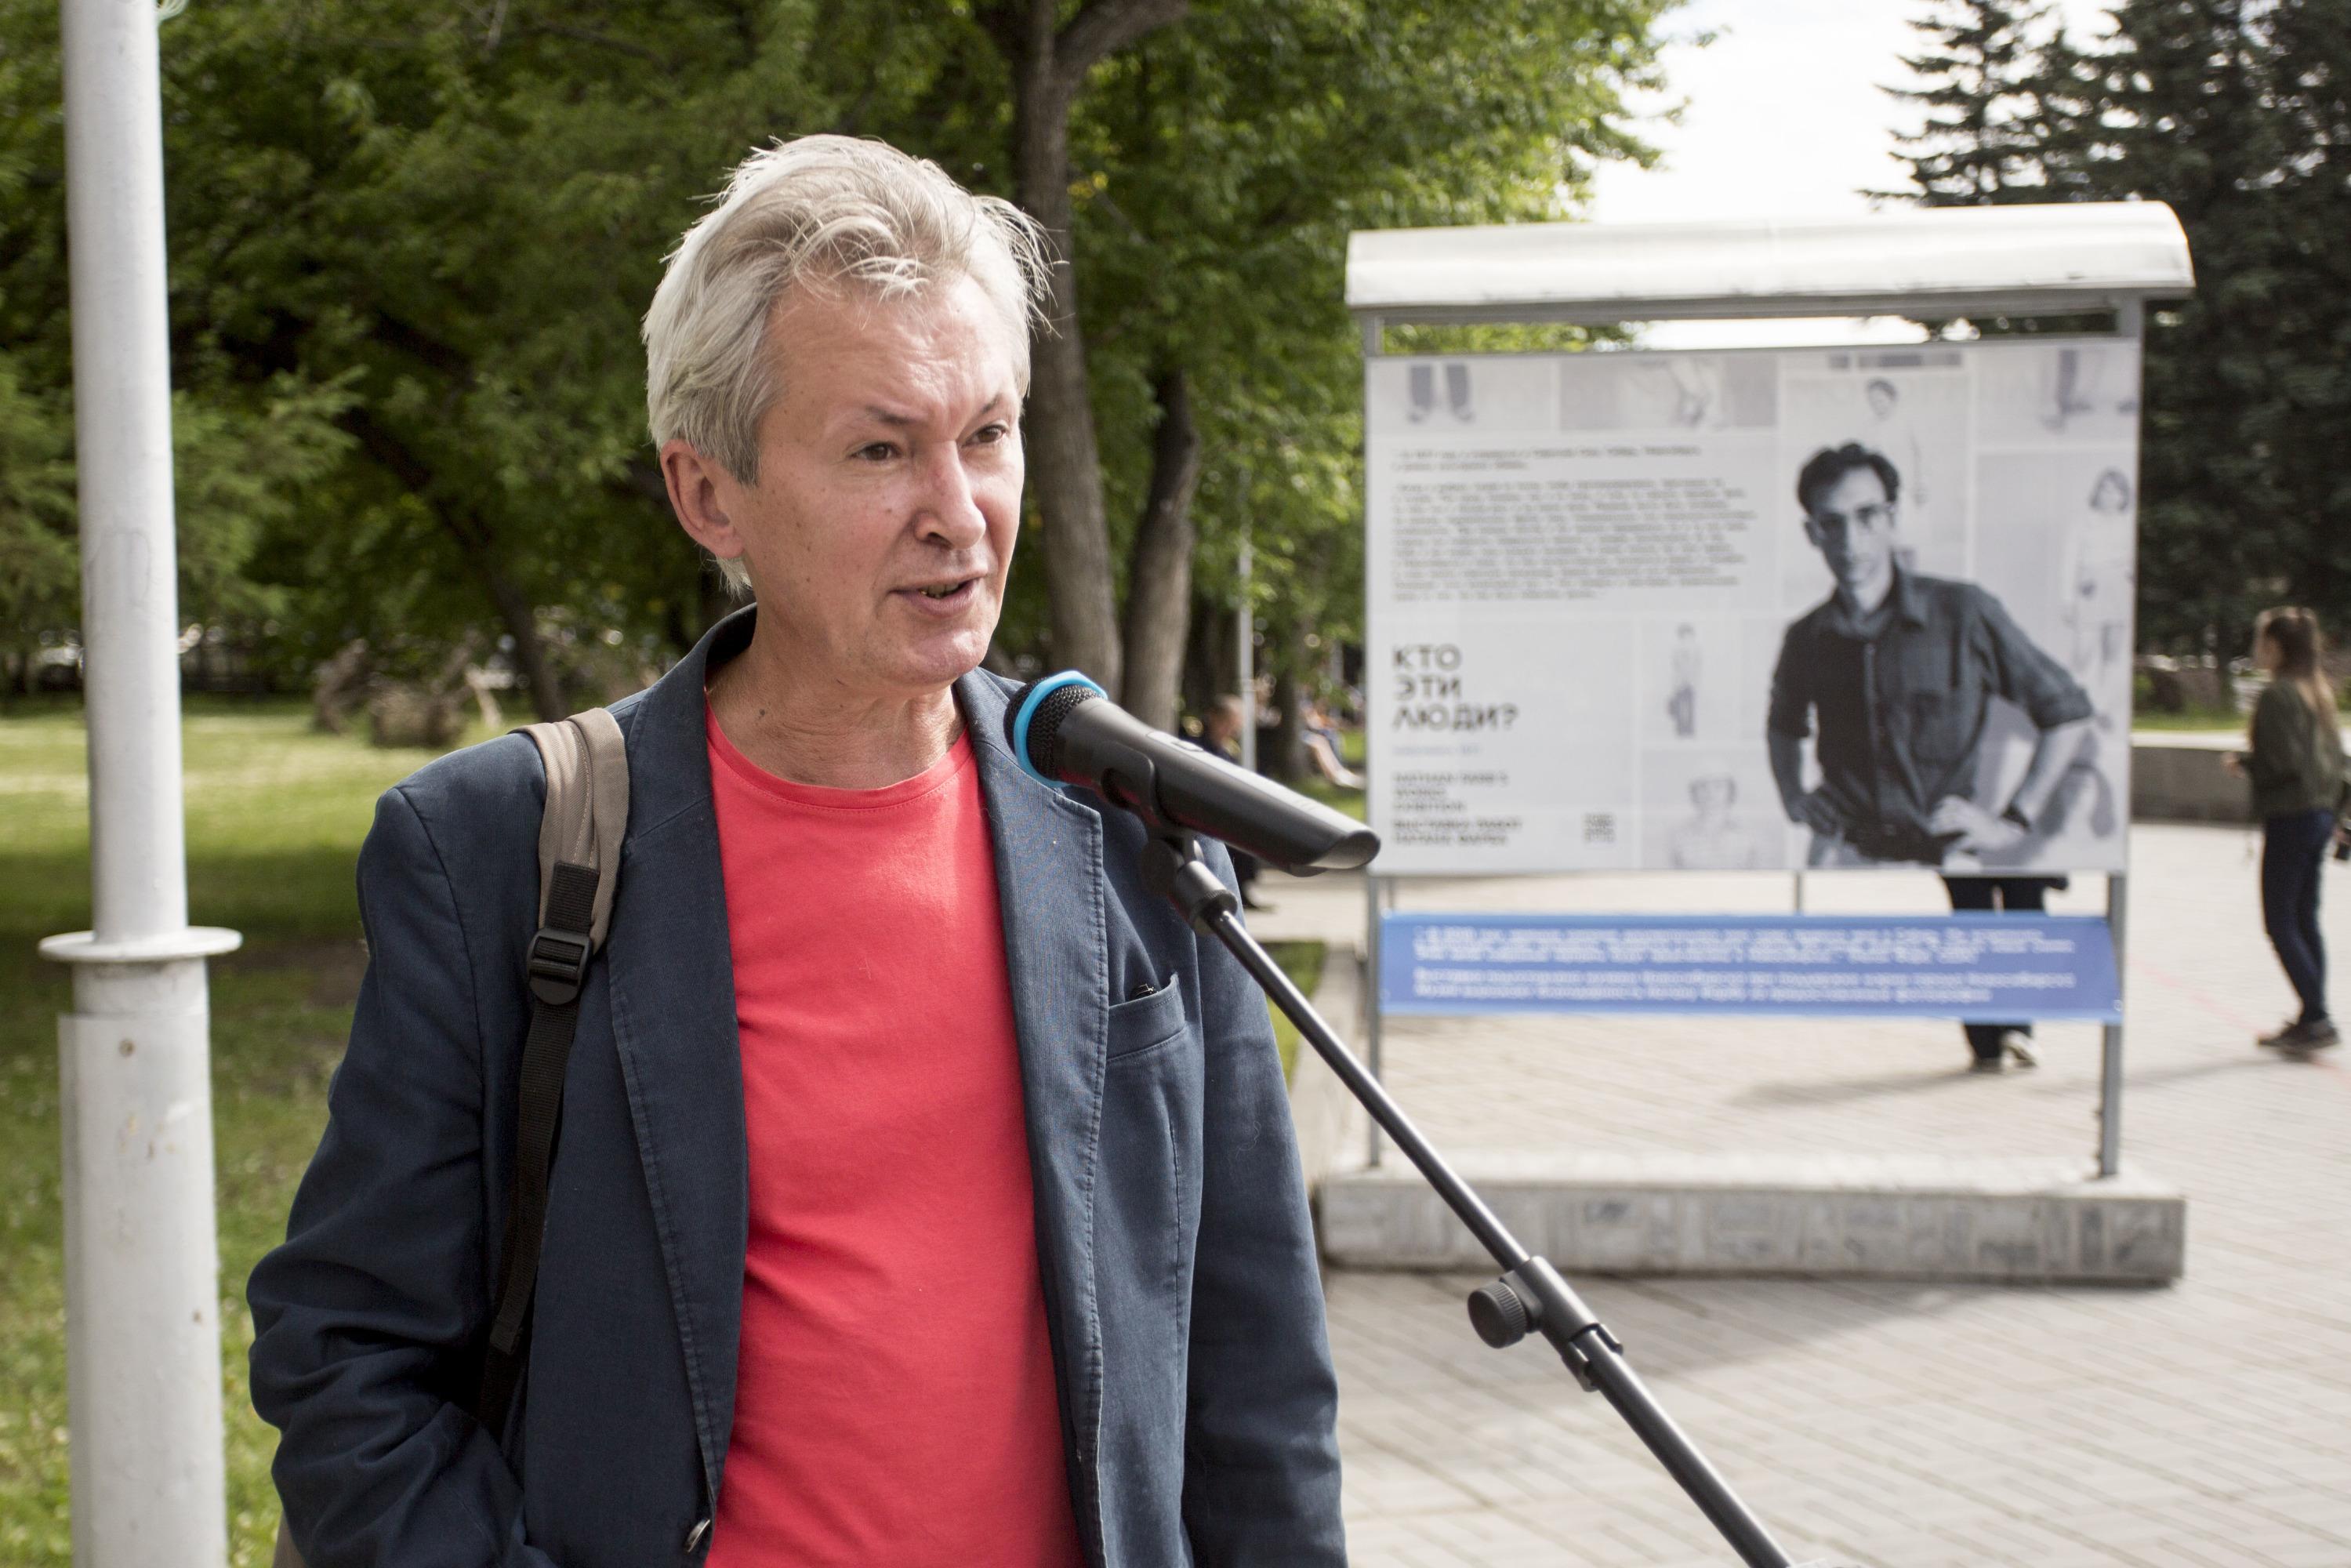 Журналист Яков Самохин узнал на снимках своего отца